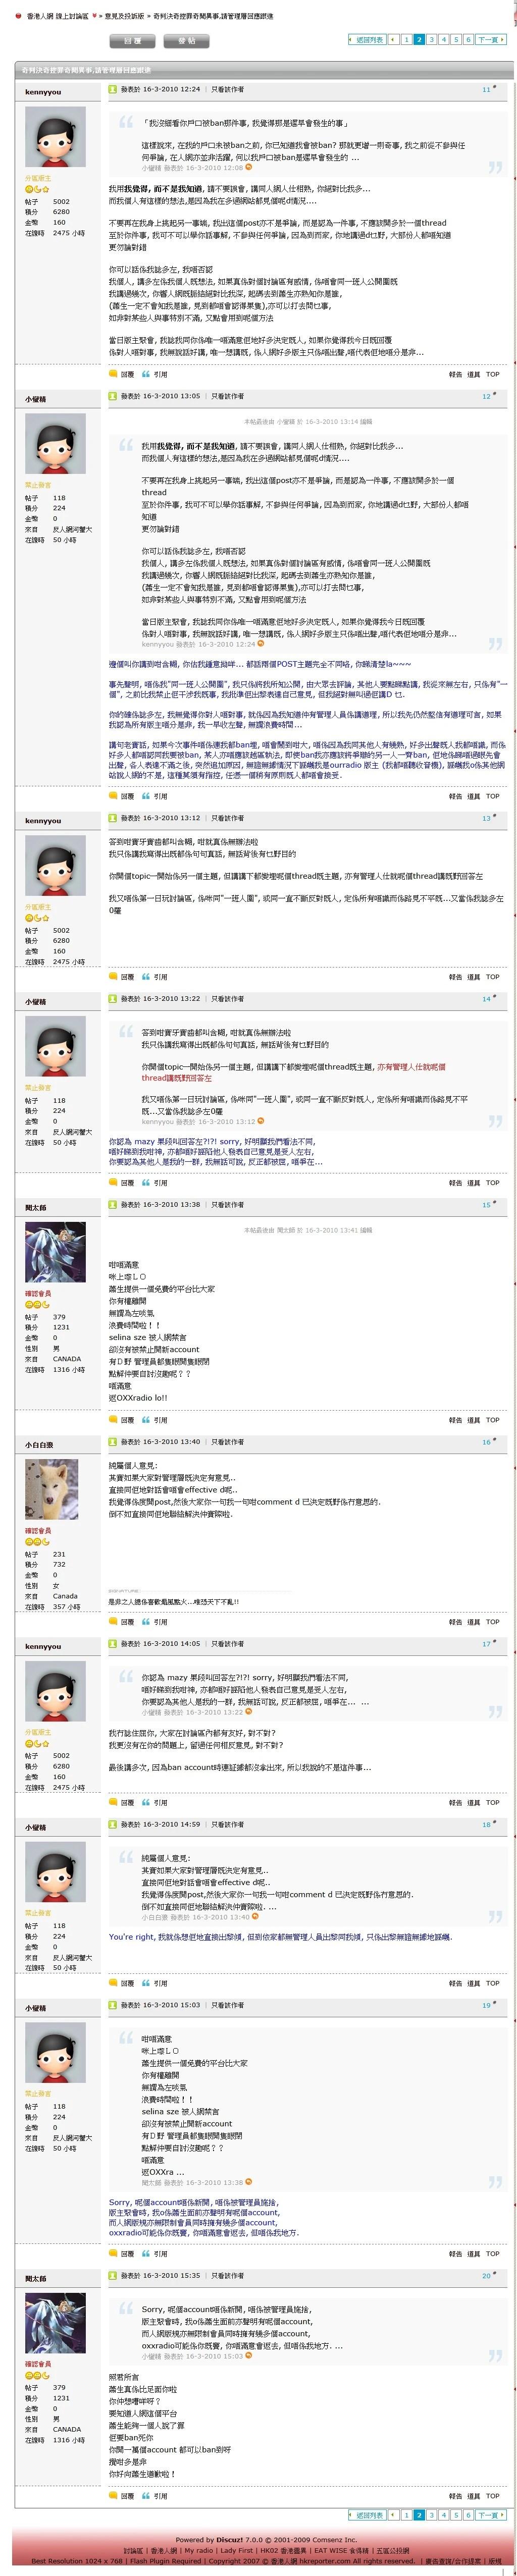 圖像 - Kfkss2.jpeg   香港網絡大典   FANDOM powered by Wikia